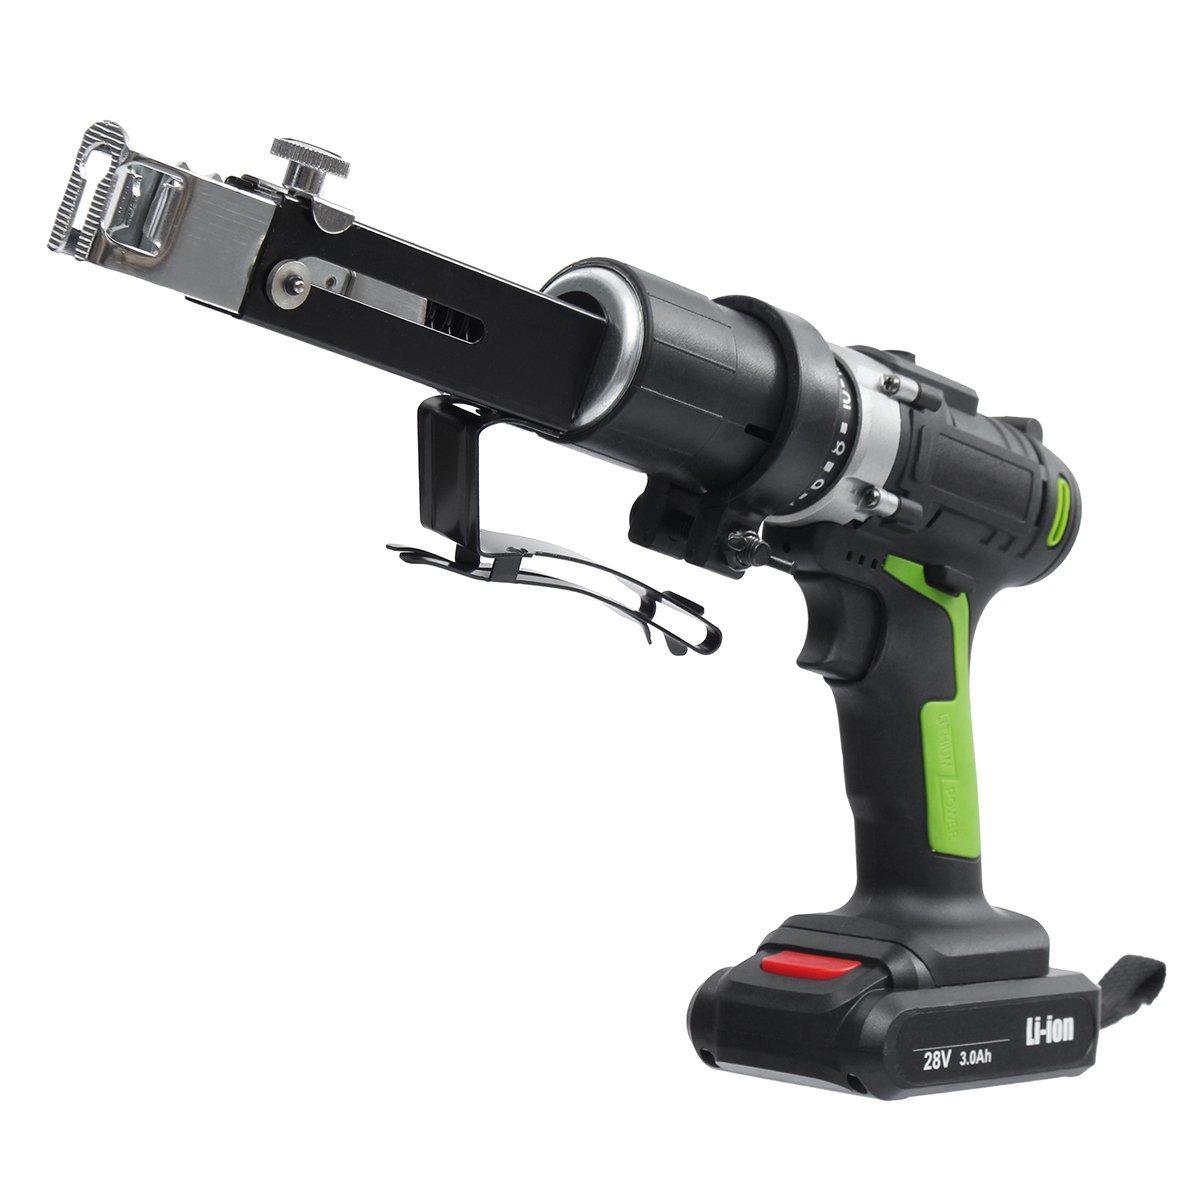 28V Electric Chain Drill Power Drills Chain Gun Rechargable Elecreic Drill 2 Batteries 1 Charger